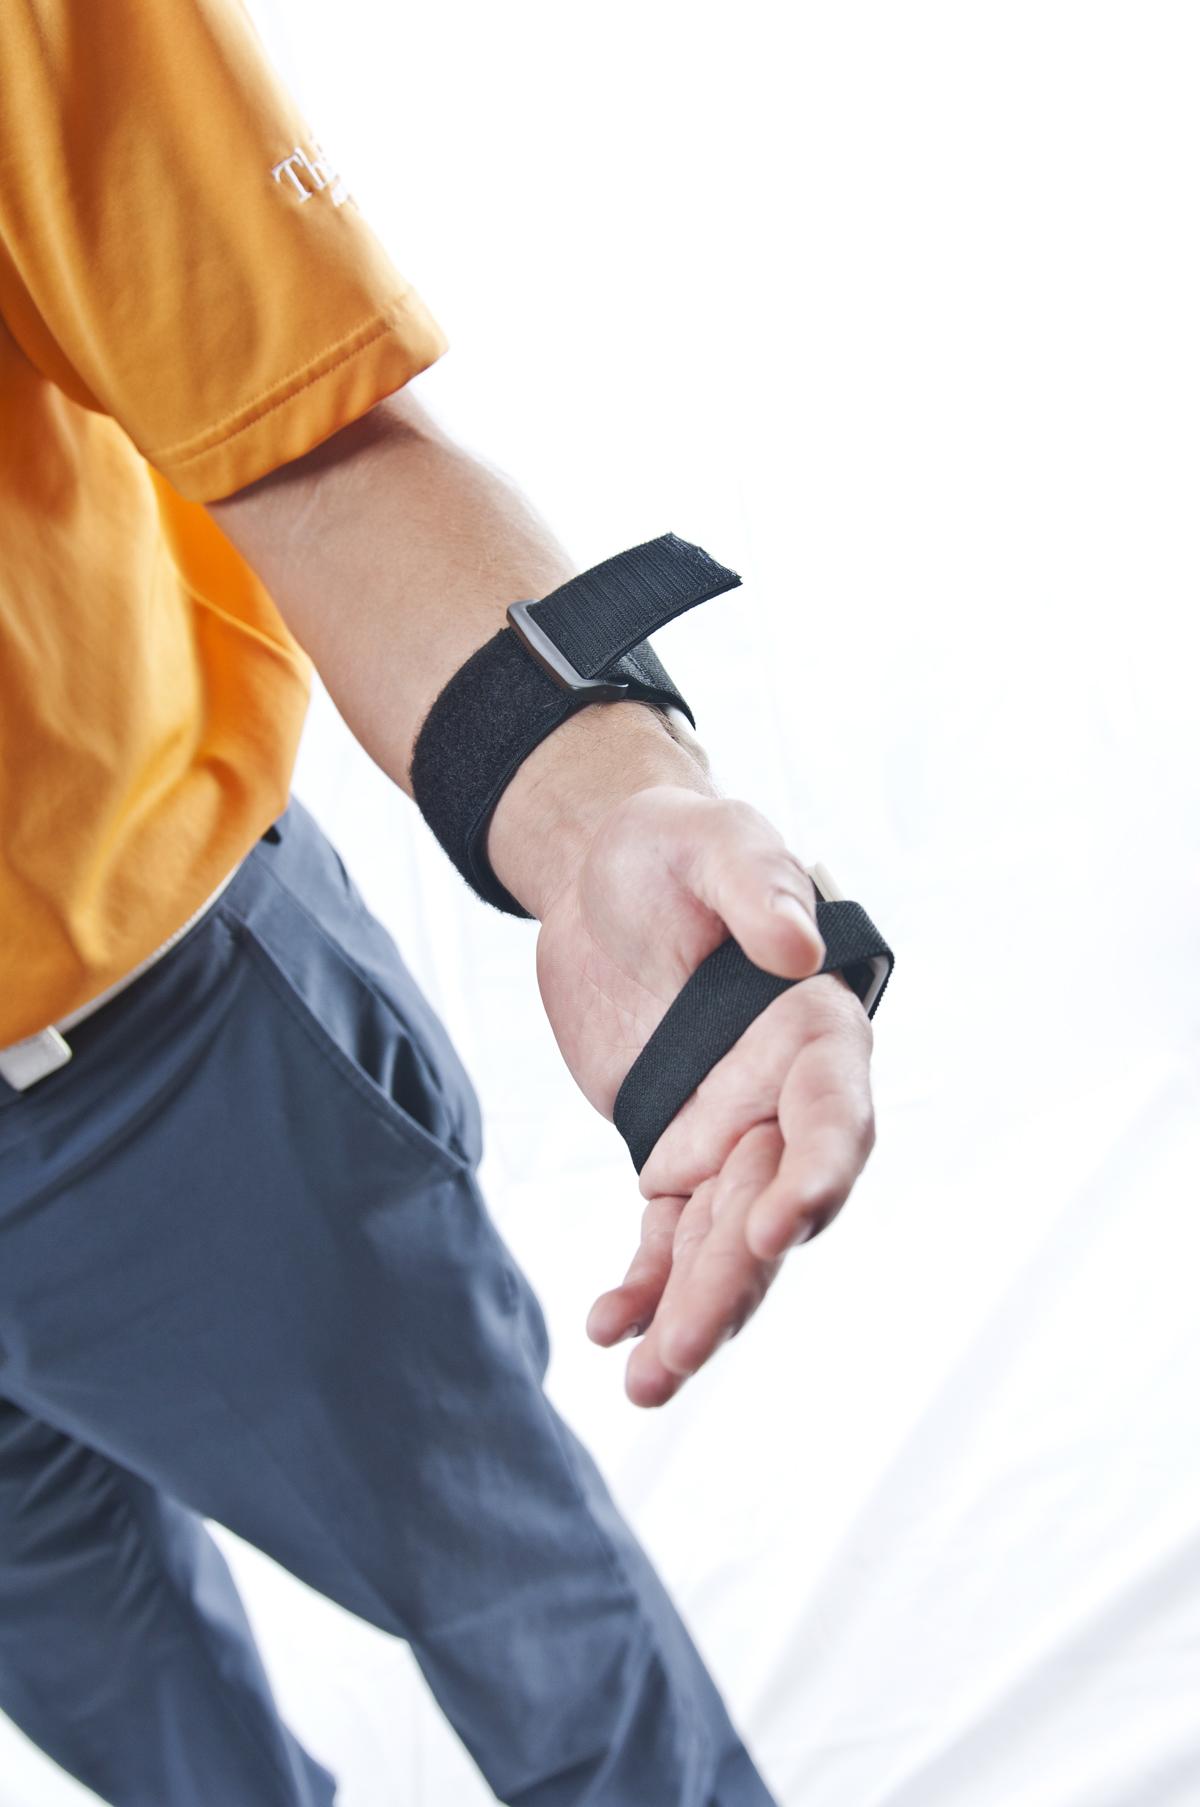 WrisTRAINER Lead Wrist Installation Shot 3